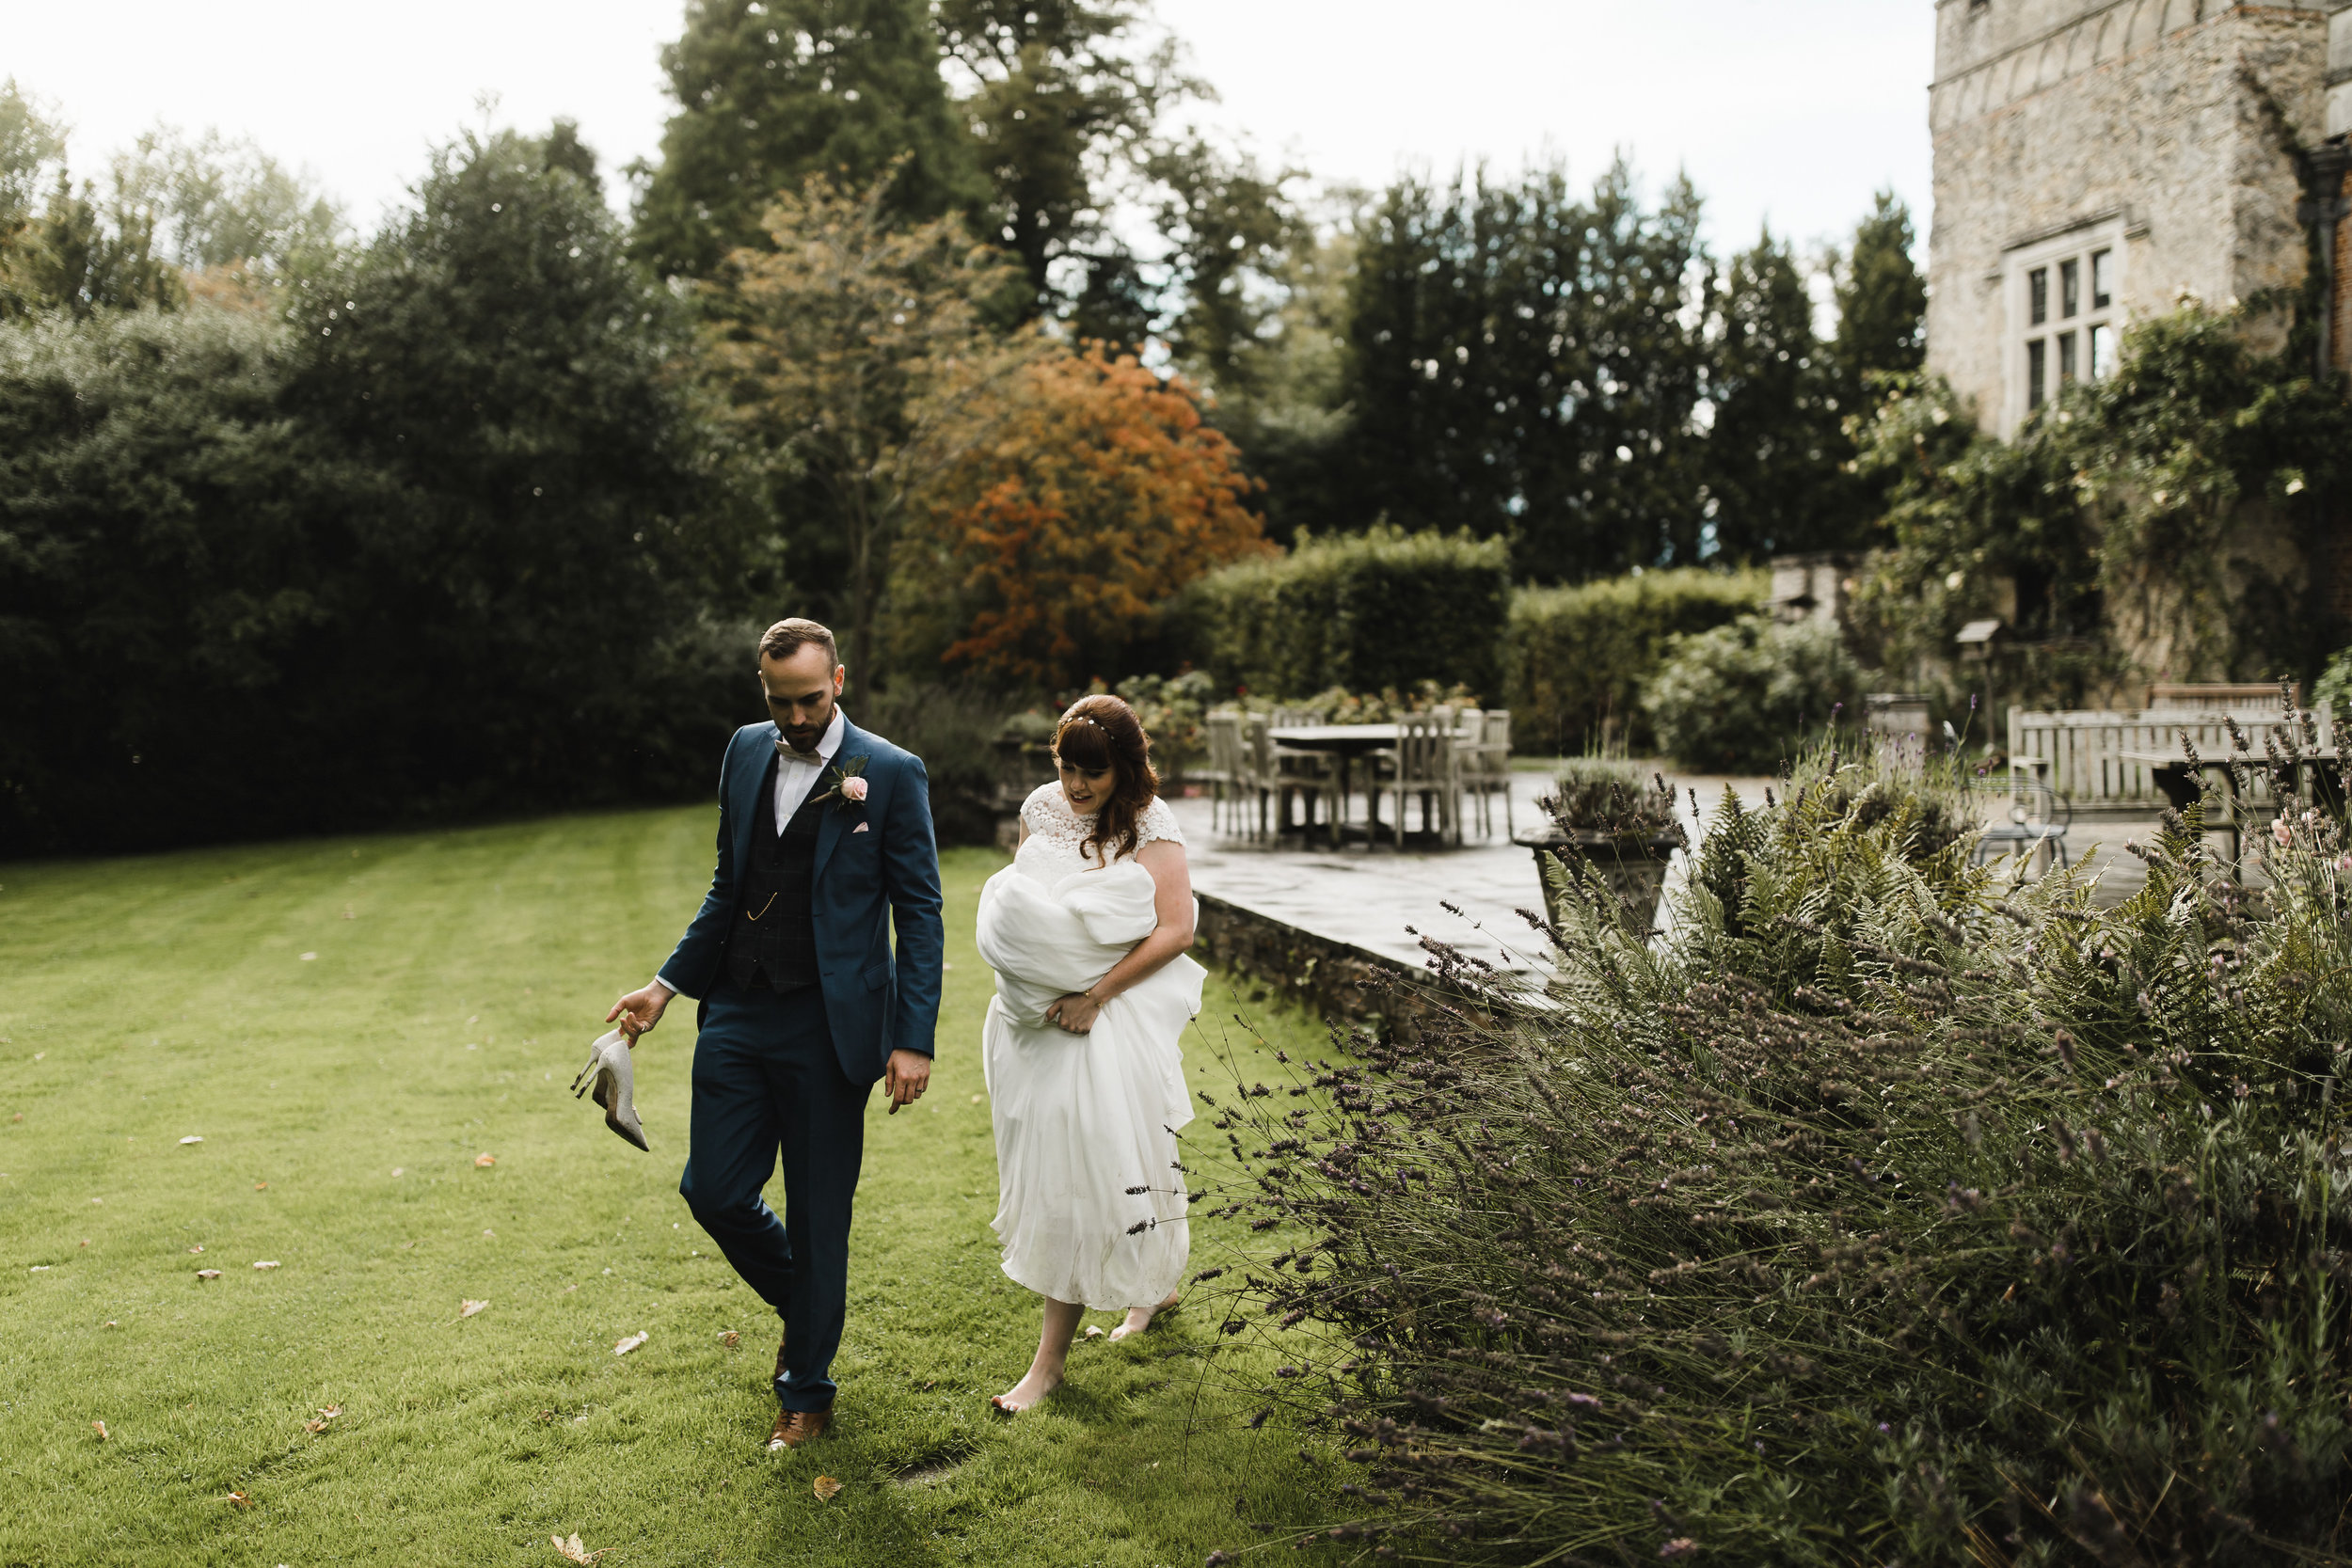 Nether_Wichendon_House_Wedding_058.jpg